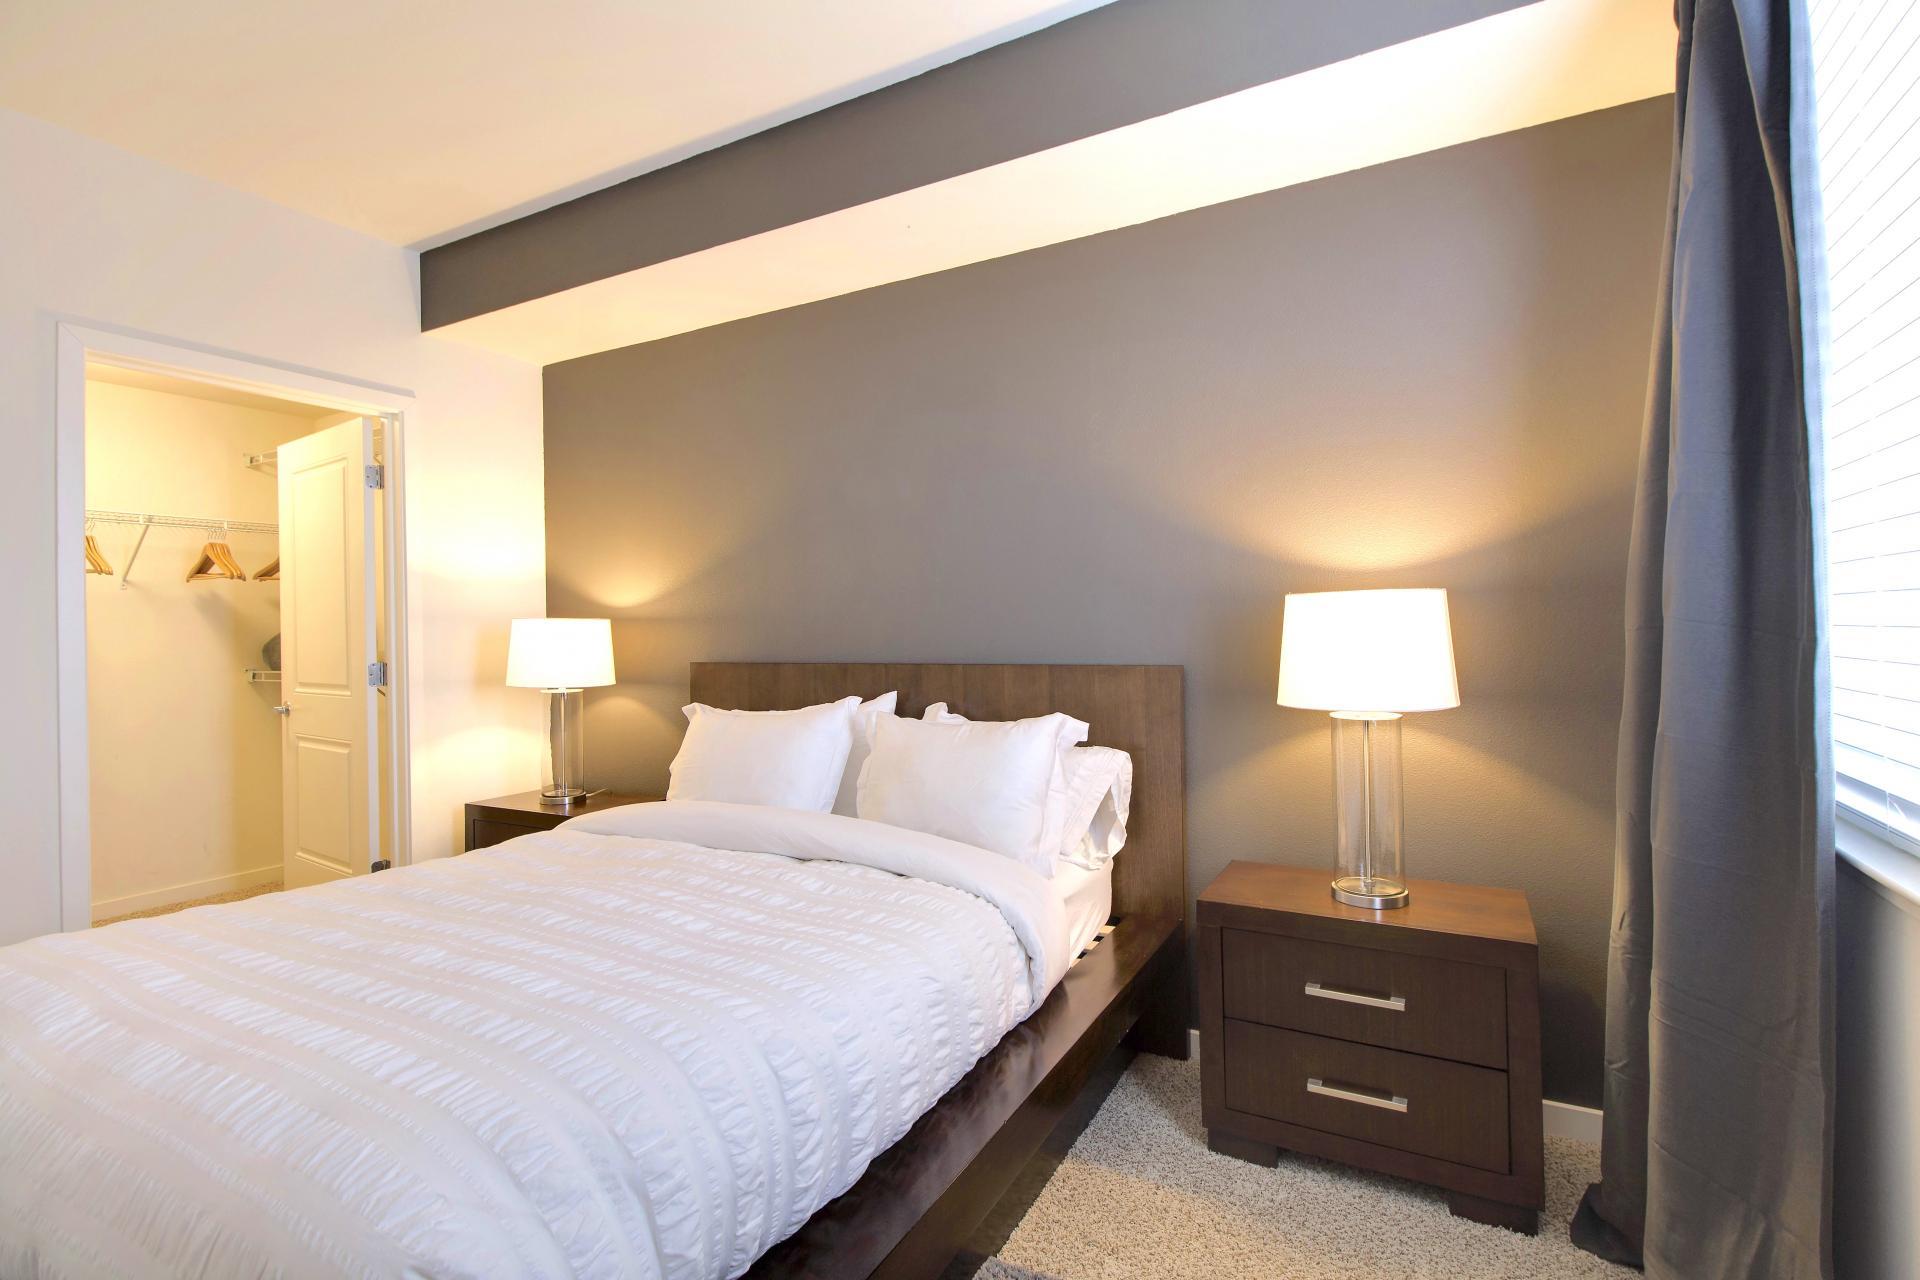 Bedroom at Park20 Apartments